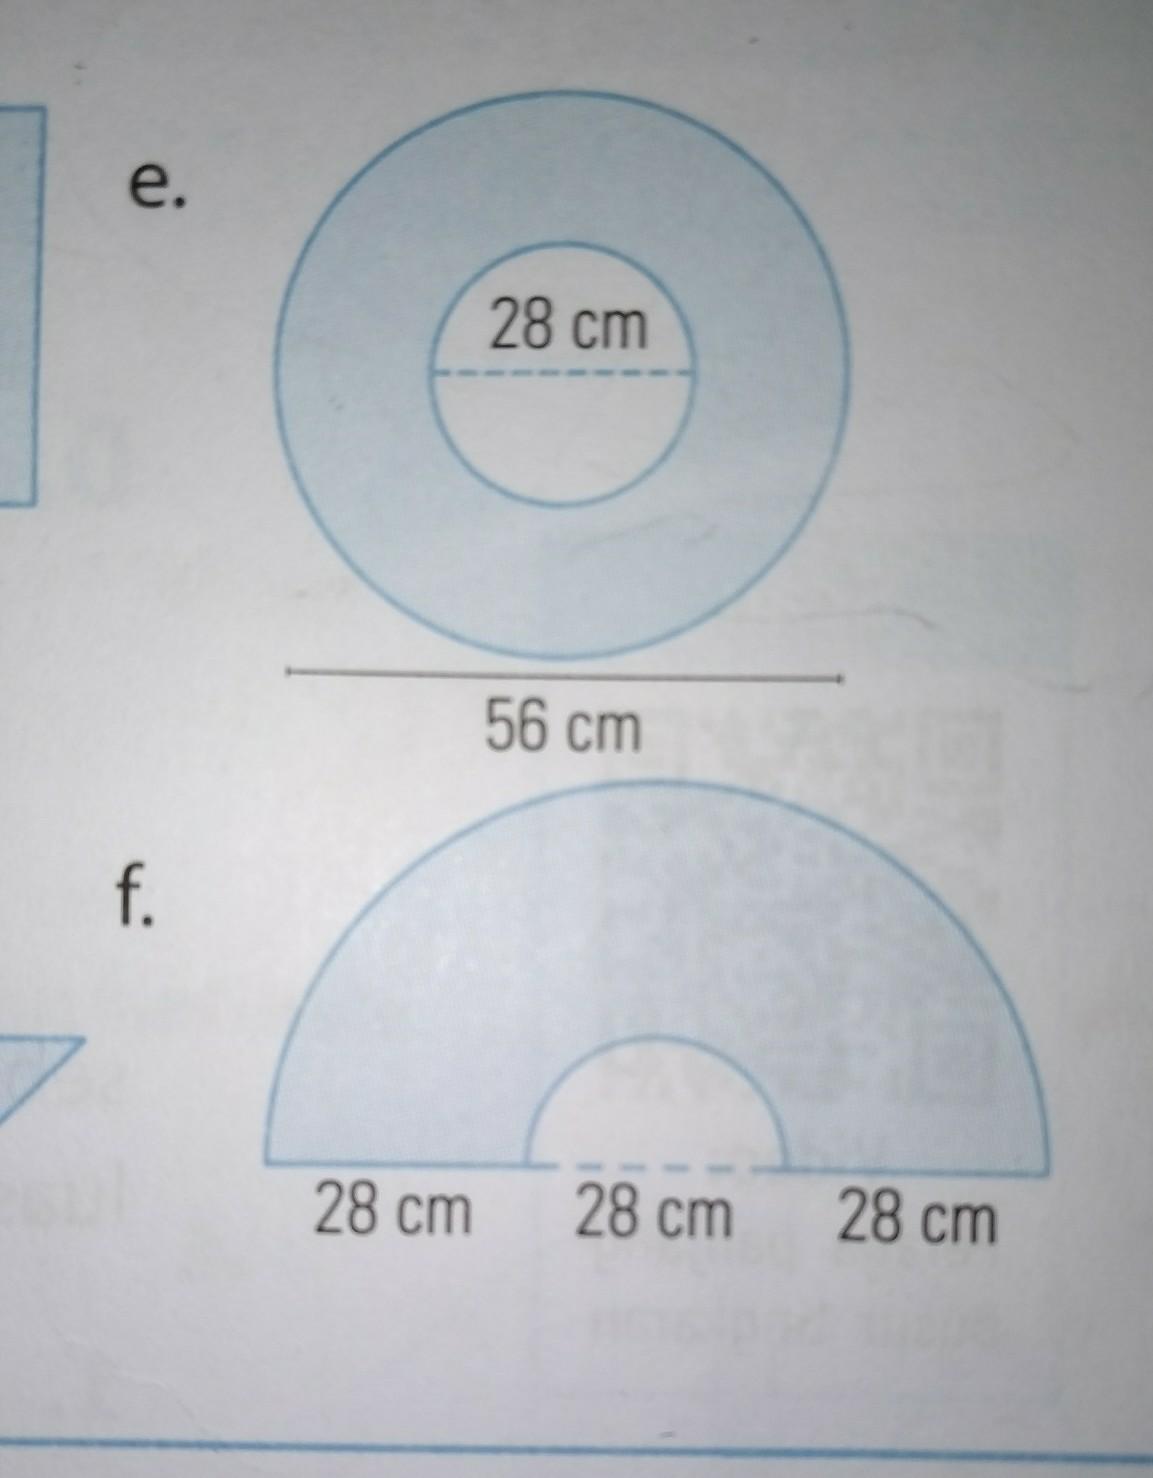 Materi Matematika Kelas 8 Kurikulum 2013 Lengkap Bab 9